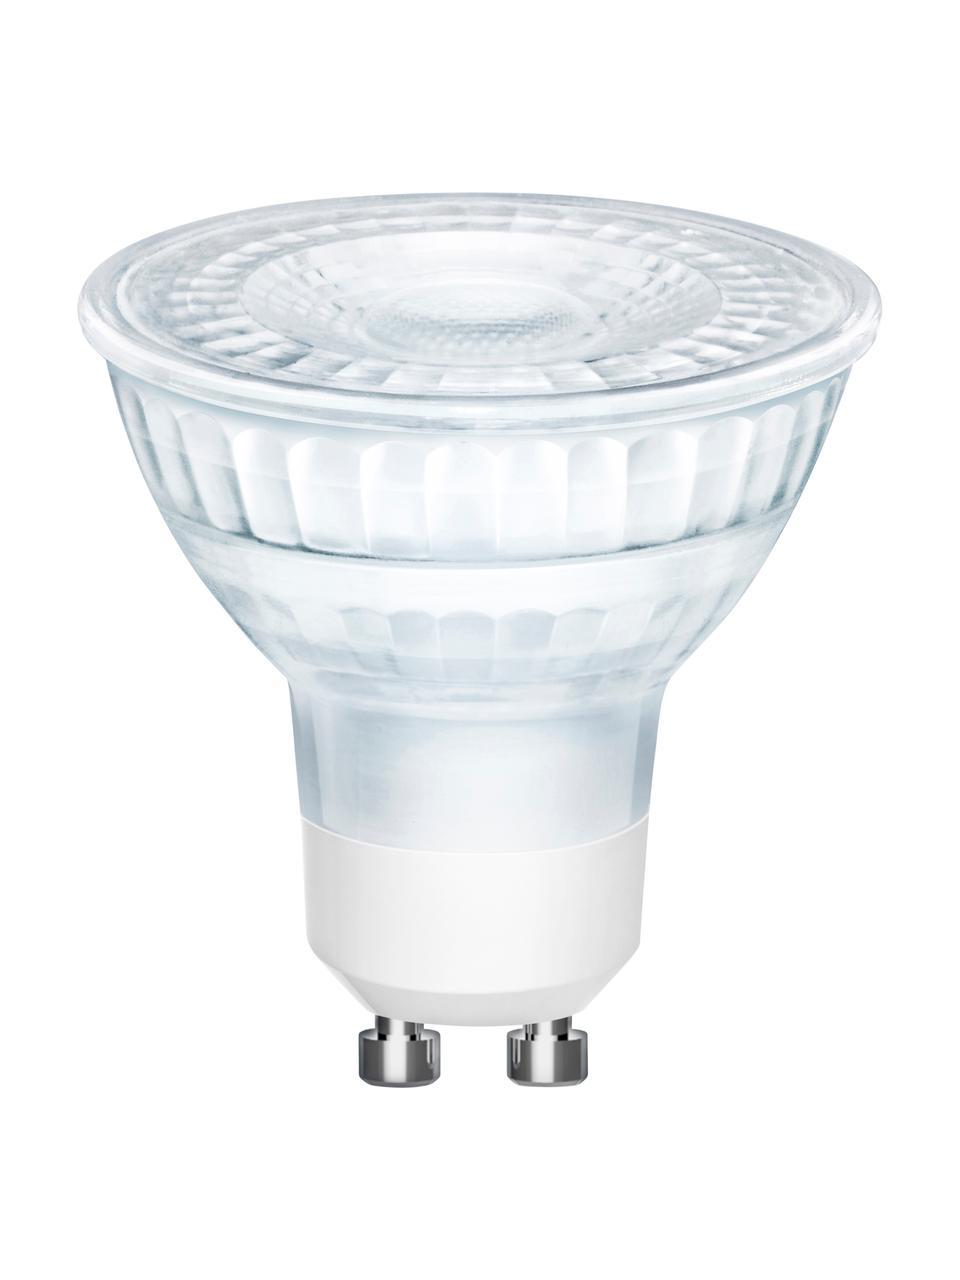 Lampadina GU10, 345lm, dimmerabile, bianco caldo, 1 pz, Paralume: vetro, Base lampadina: alluminio, Trasparente, Ø 5 x Alt. 6 cm